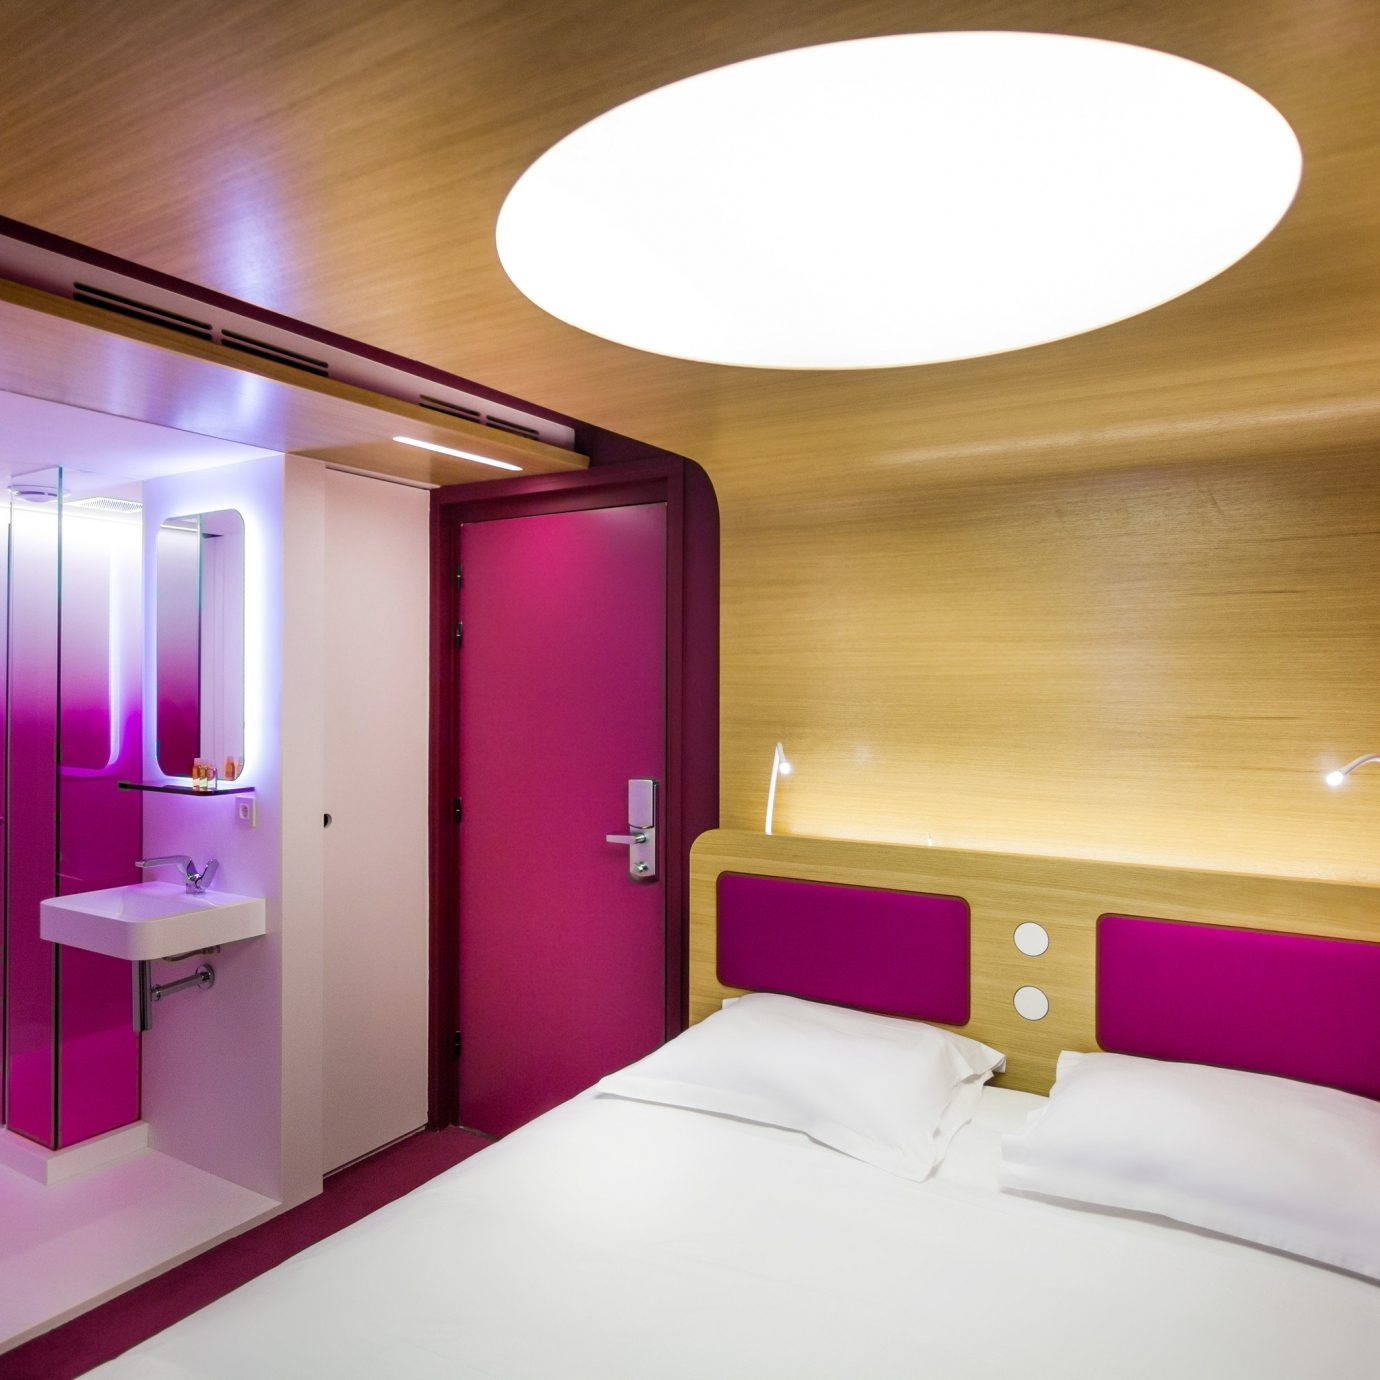 Bedroom Business City Hip Modern Resort Romance Romantic property Suite purple lamp